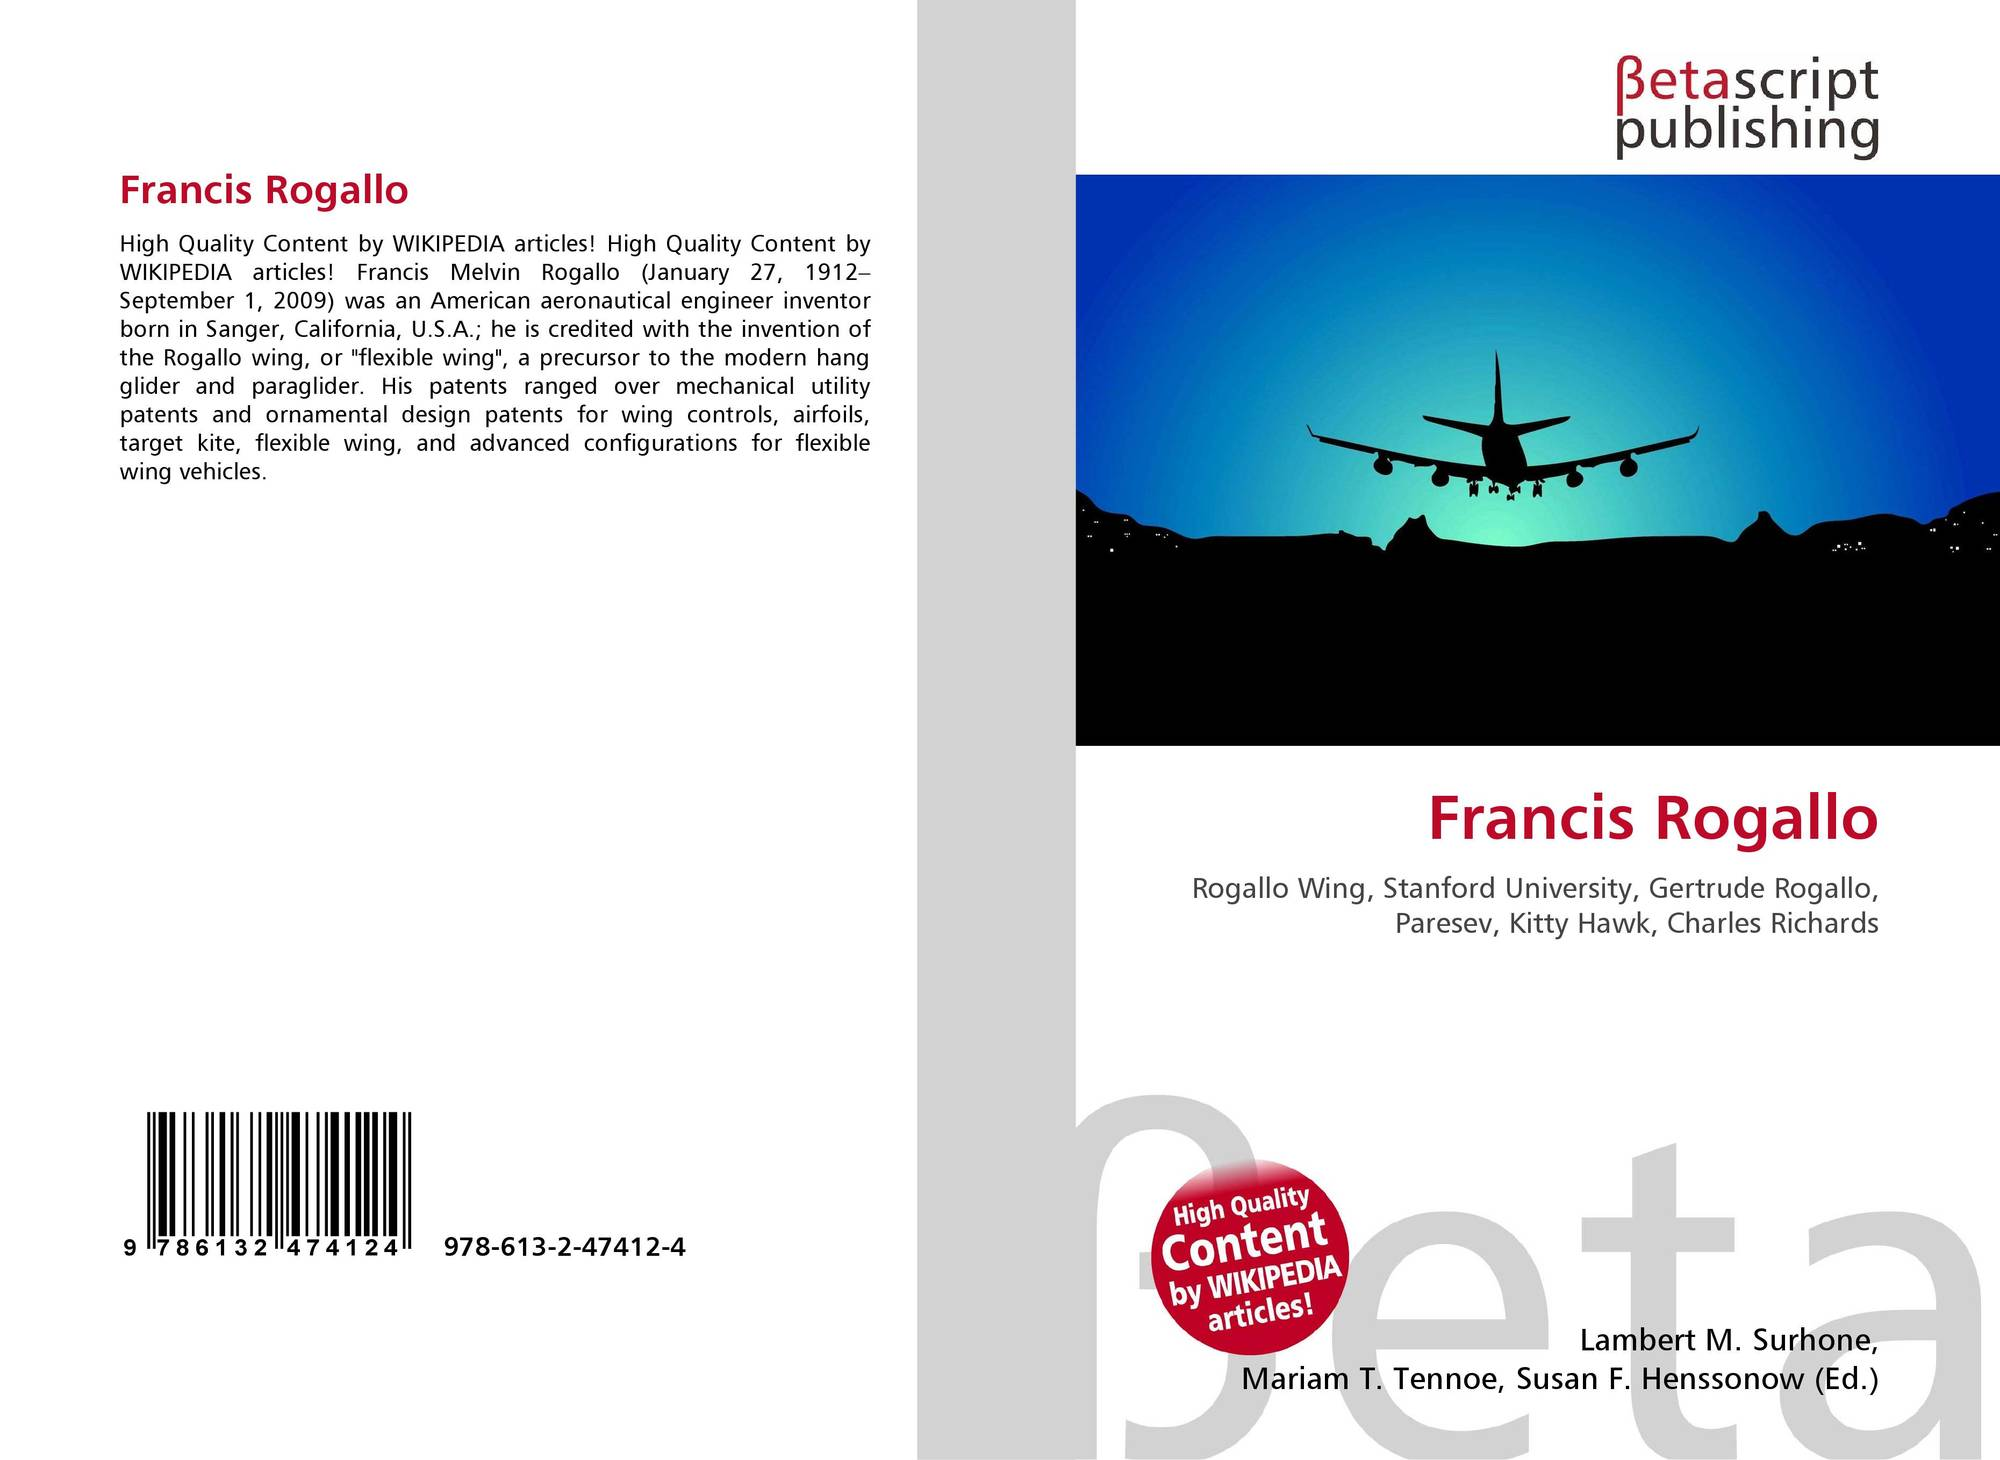 Francis Rogallo, 978-613-2-47412-4, 6132474129 ,9786132474124